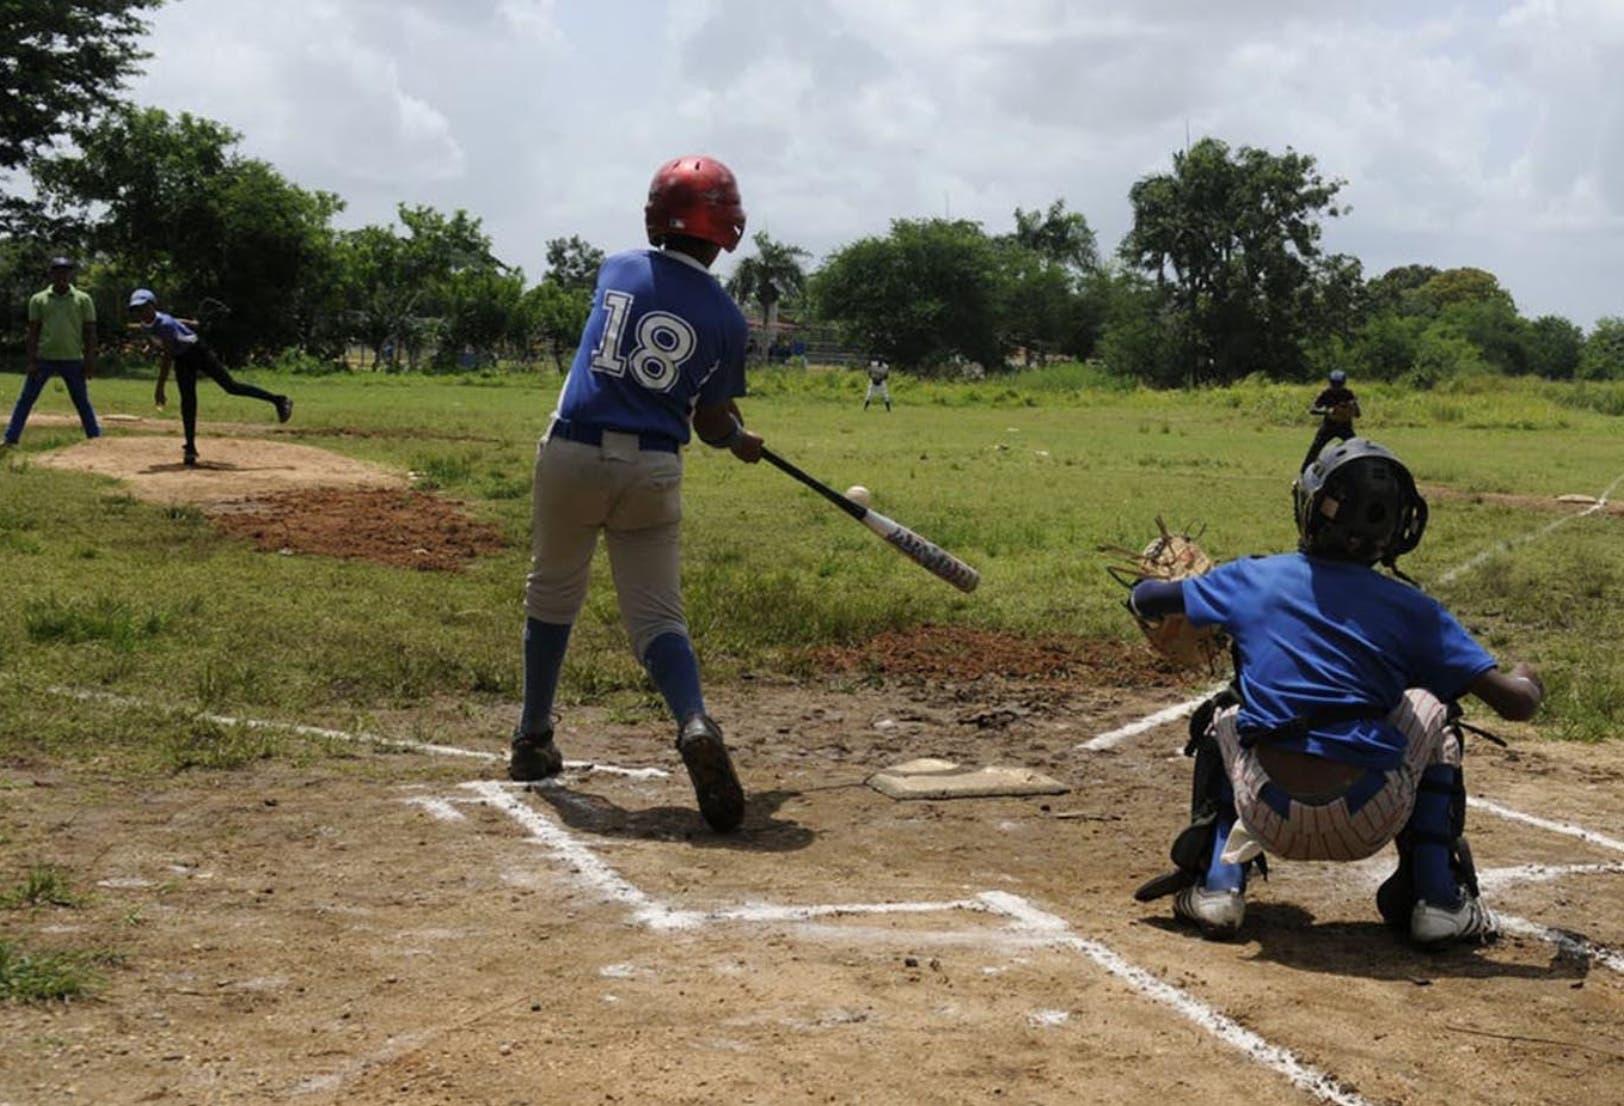 FBI investiga a MLB por firmas niños 12 años RD